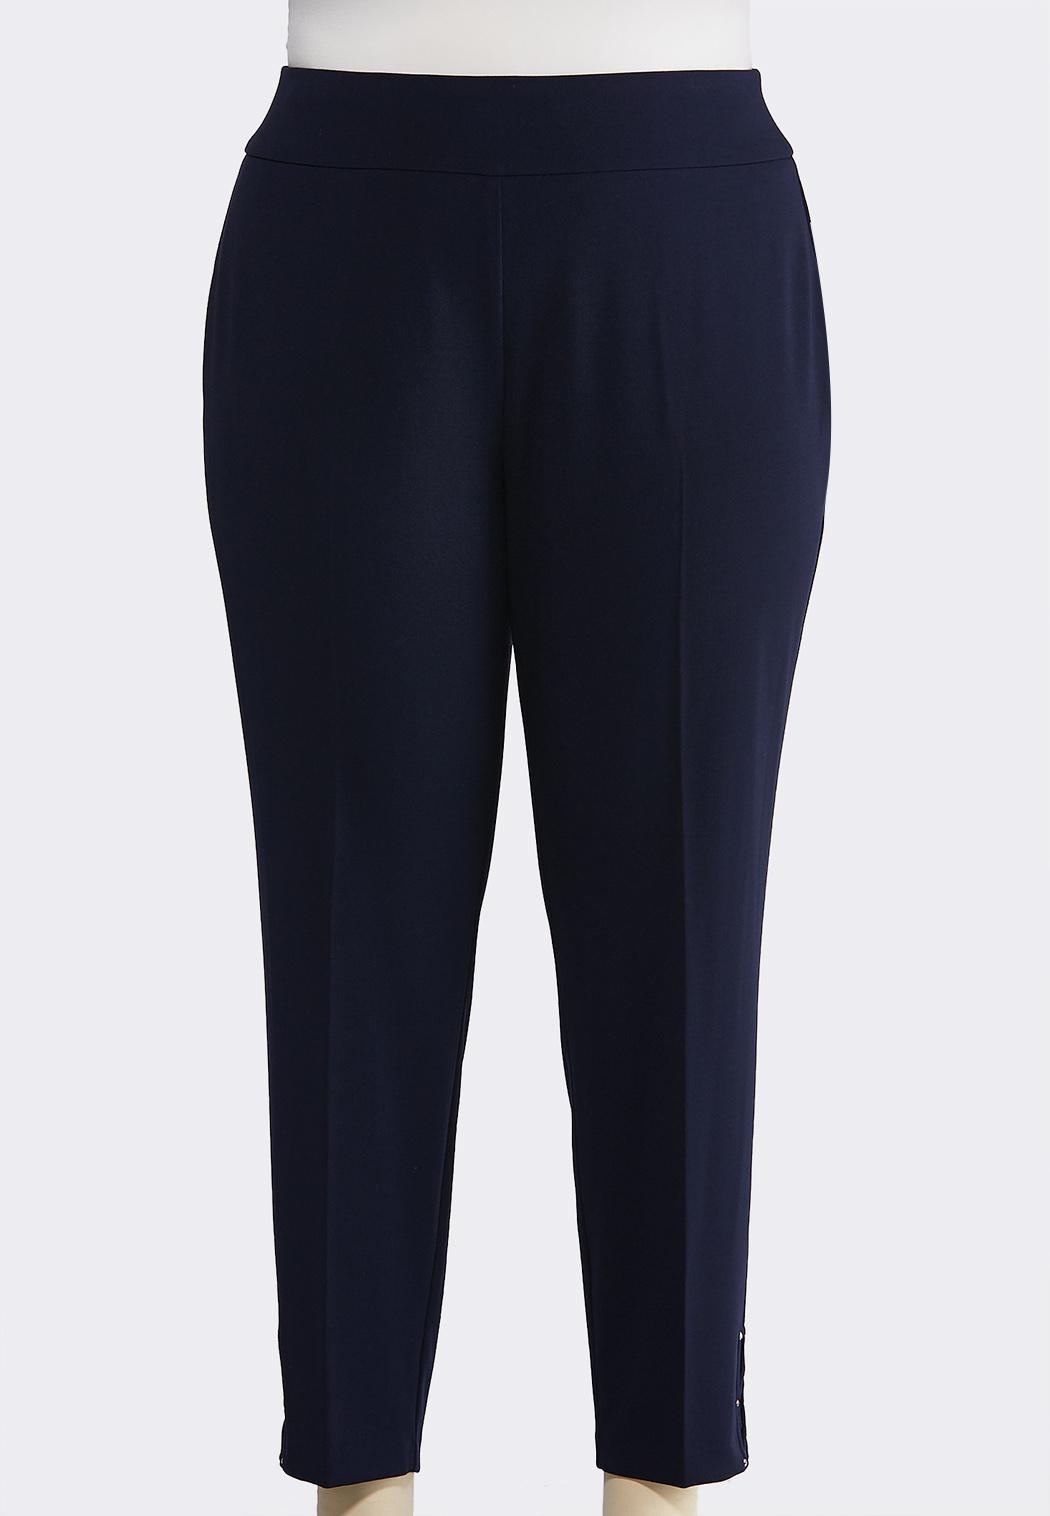 b43a3cf579e Plus Size Embellished Ankle Pants Slim Cato Fashions